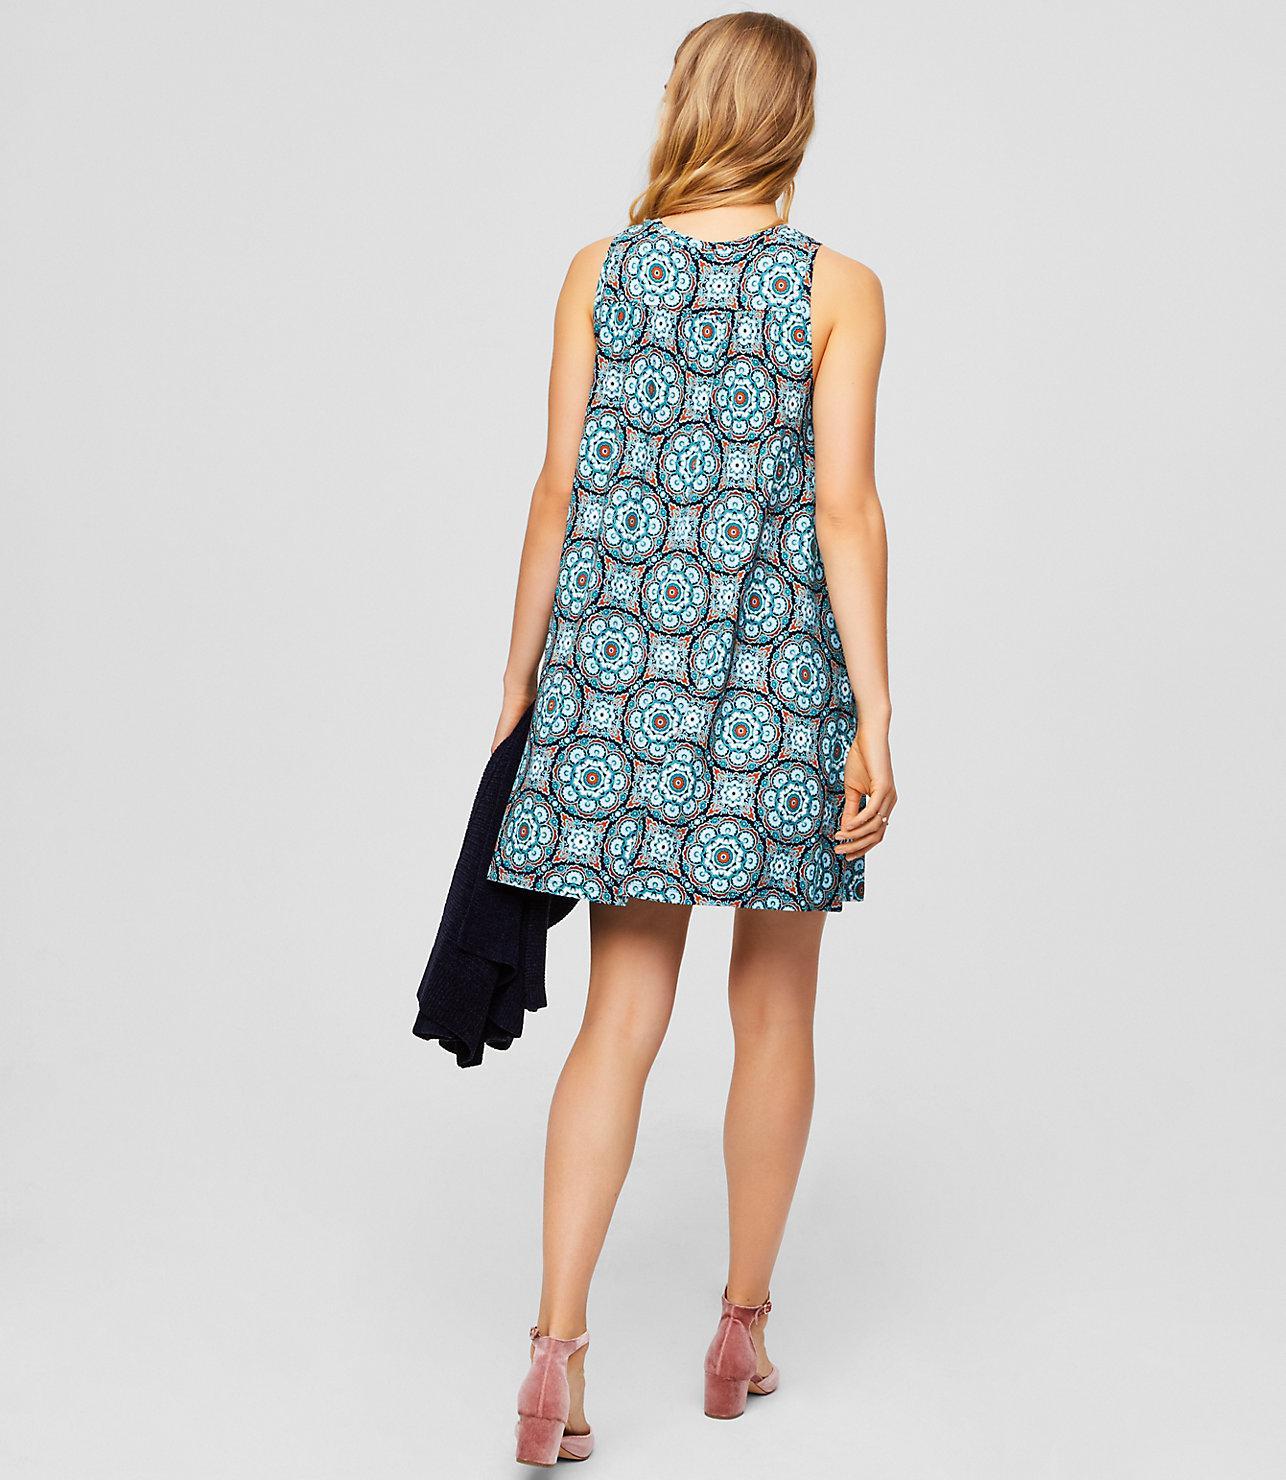 c1c077eba13 LOFT Petite Medallion Sleeveless Swing Dress in Blue - Lyst